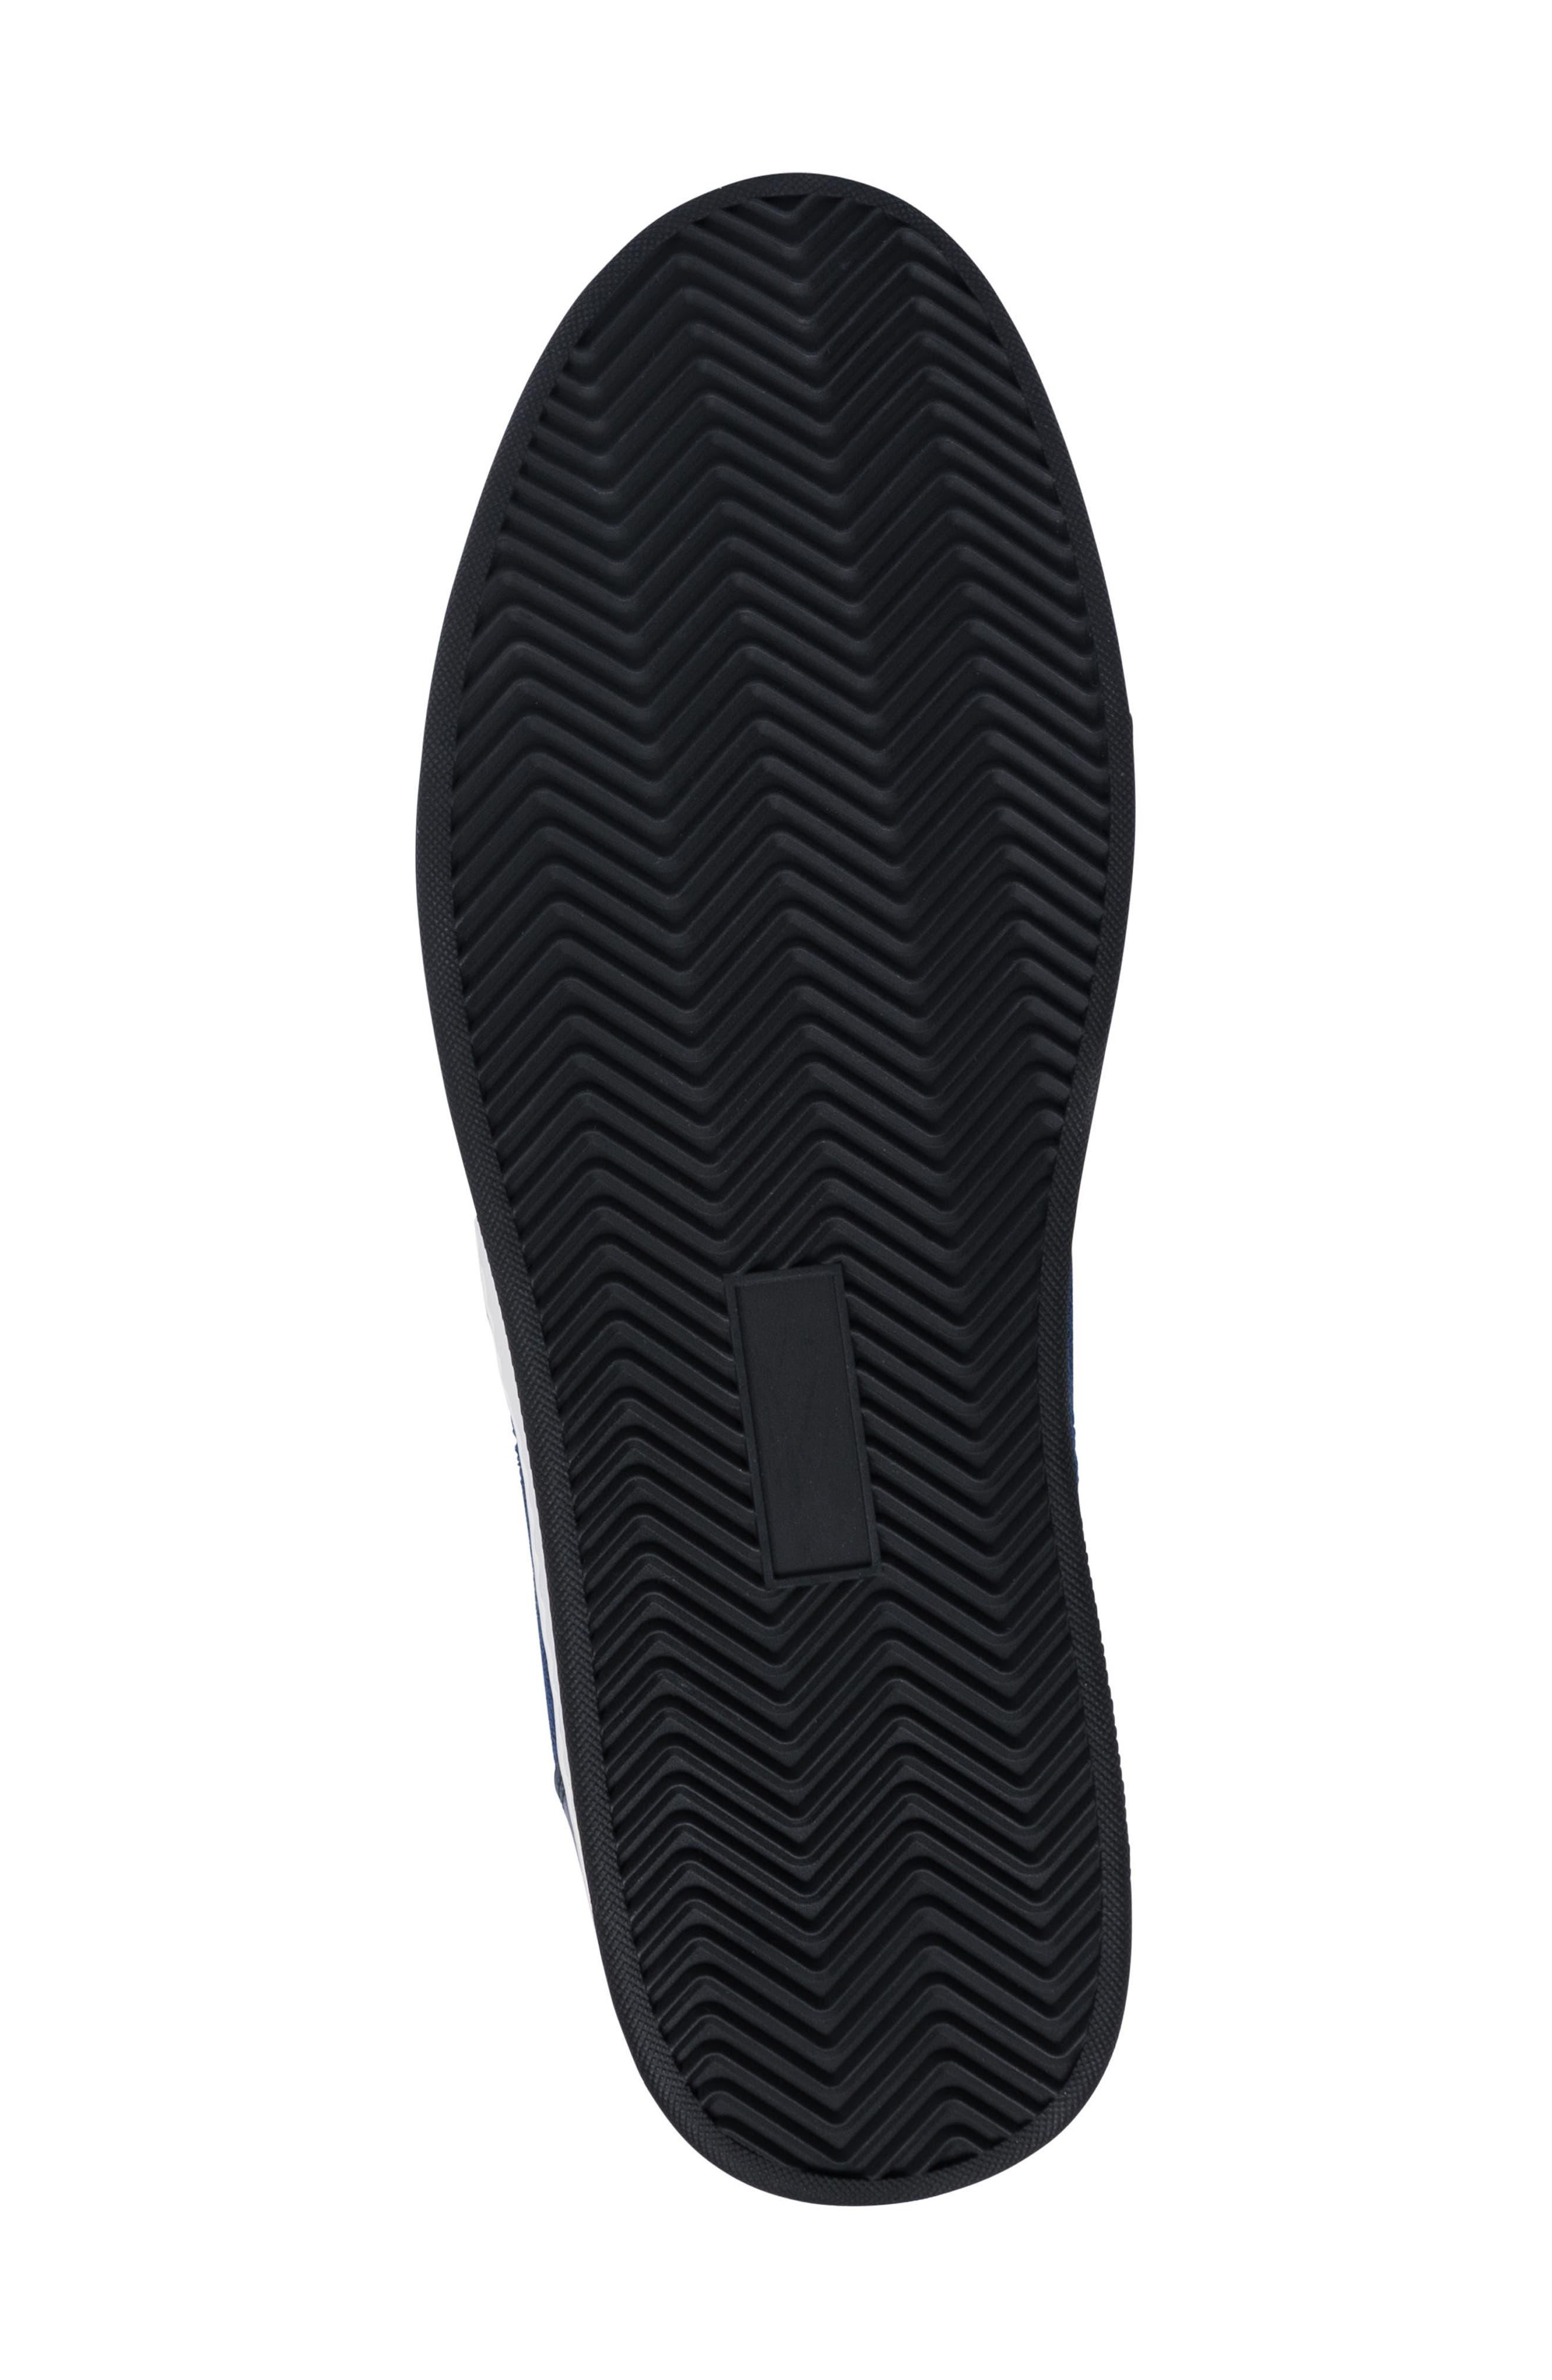 Cinque Terre Woven Slip-On Sneaker,                             Alternate thumbnail 17, color,